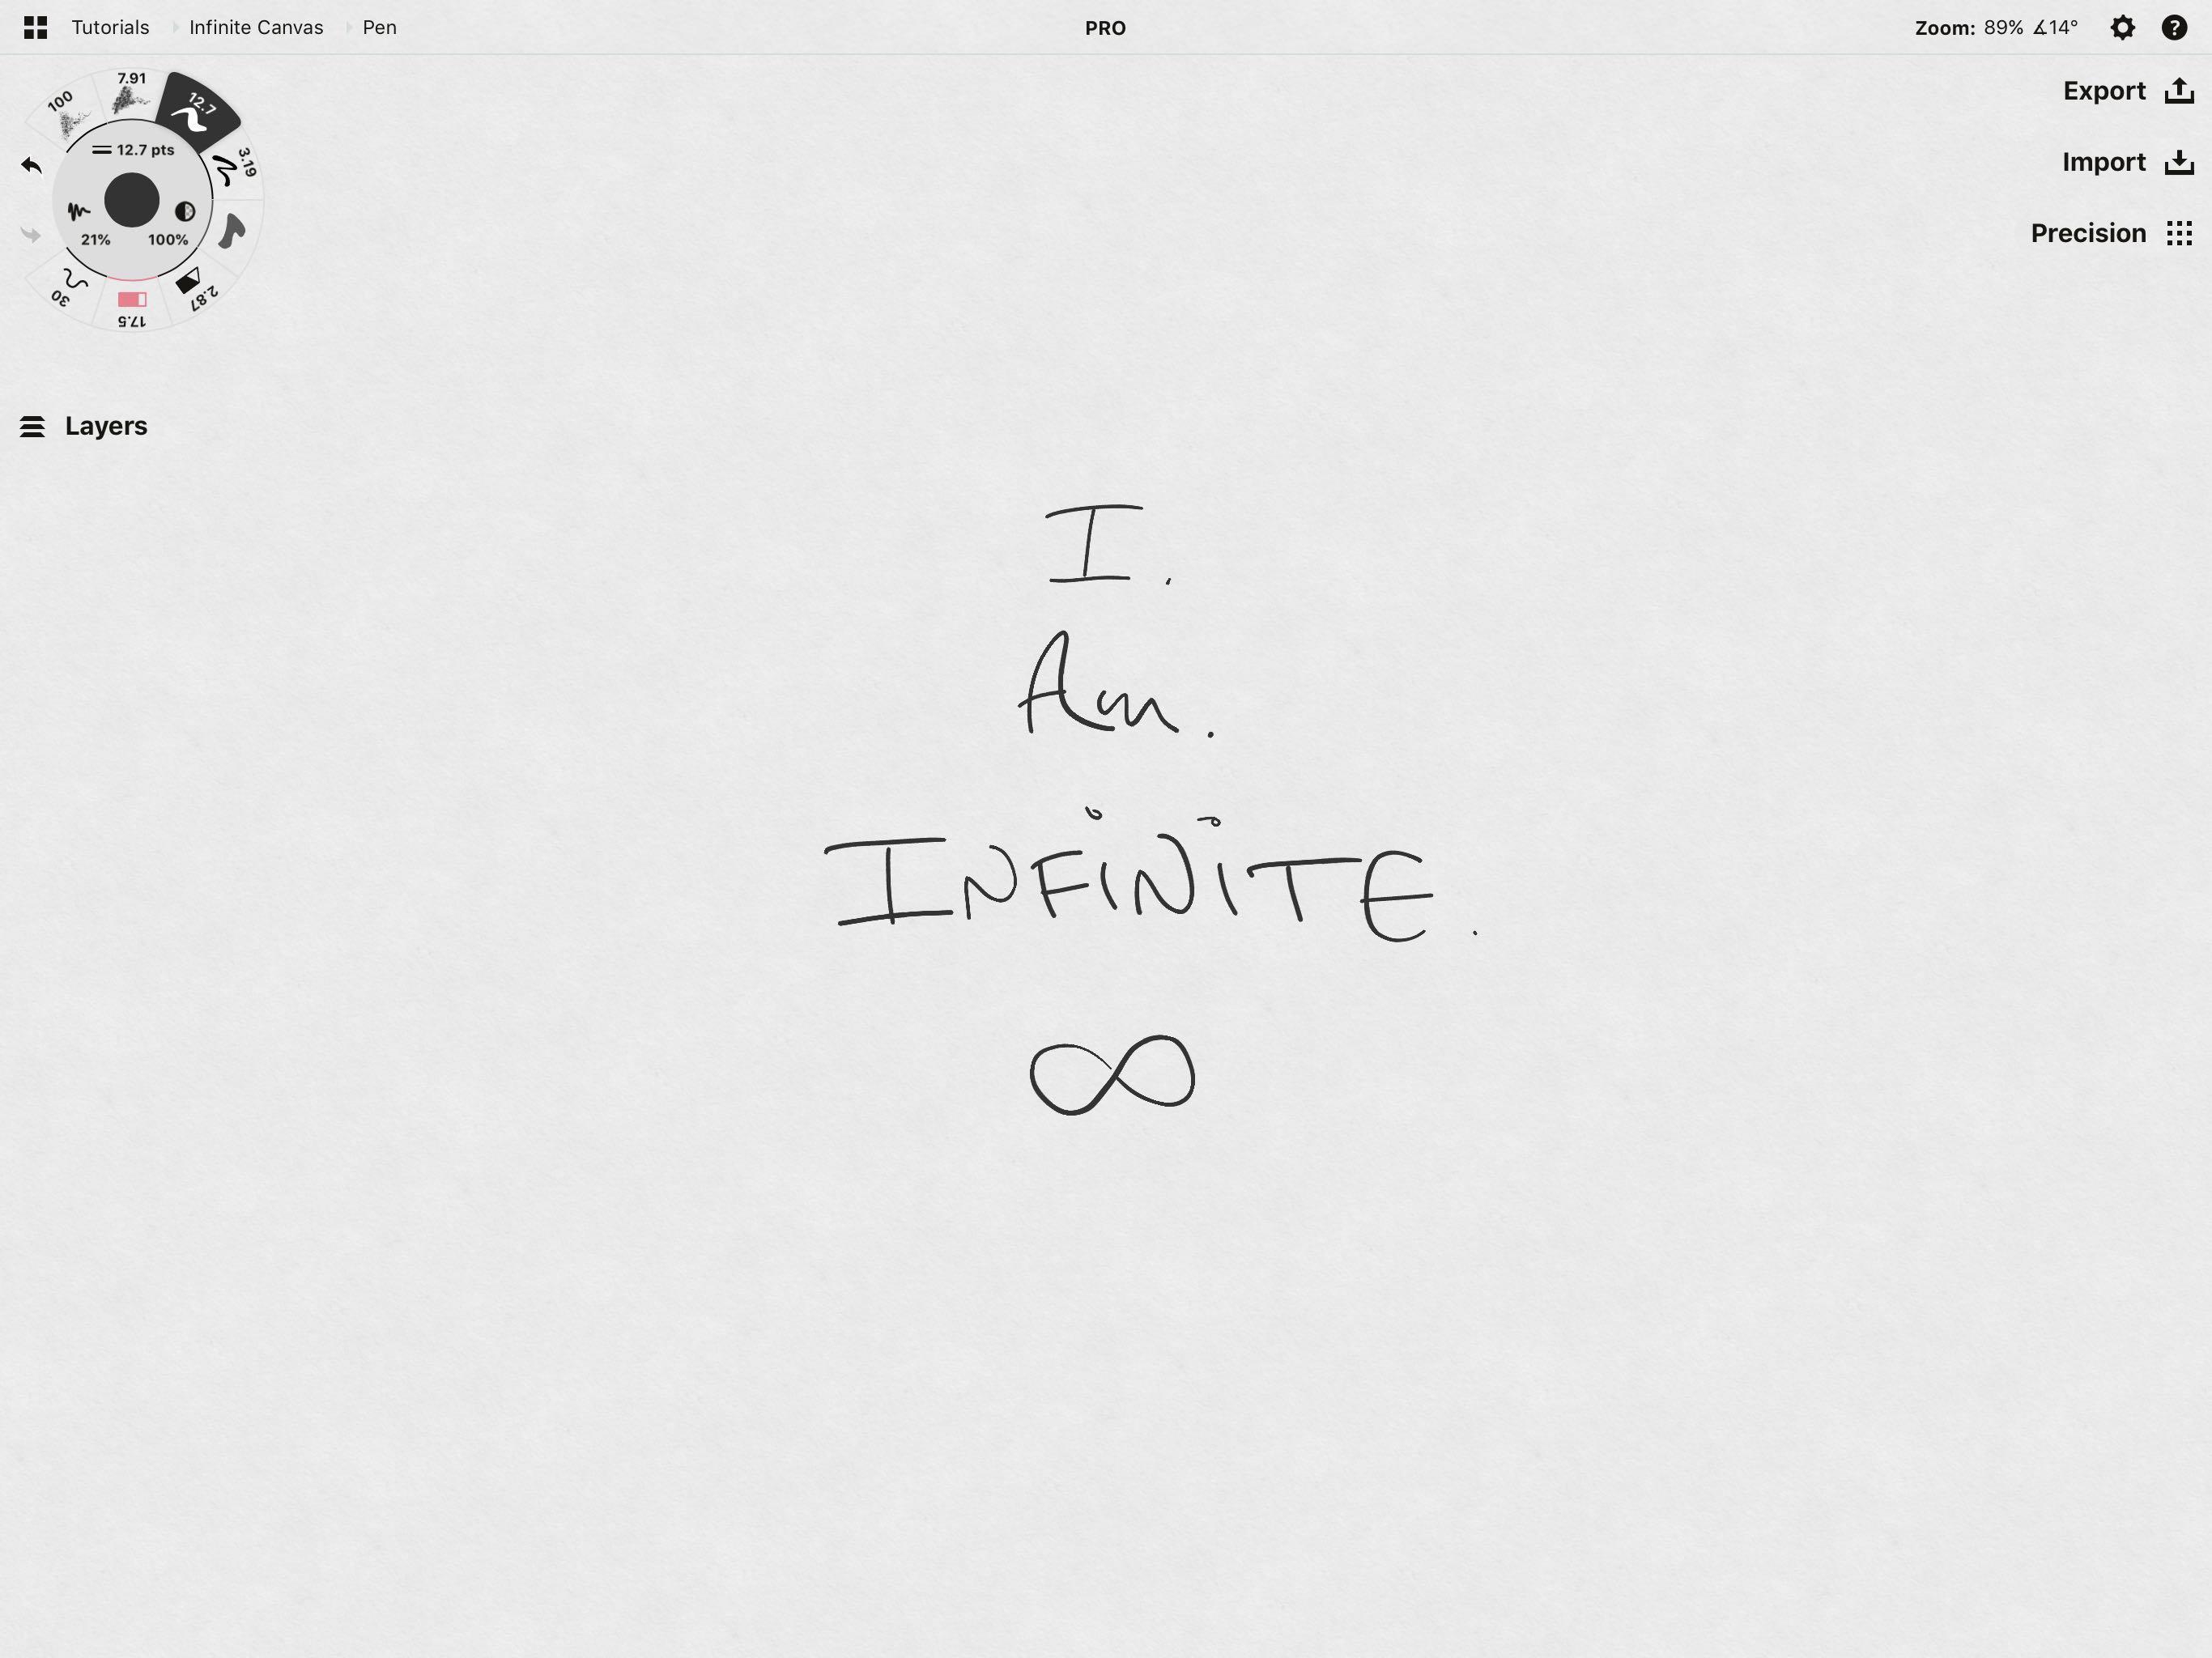 infinitecanvas_start.JPG